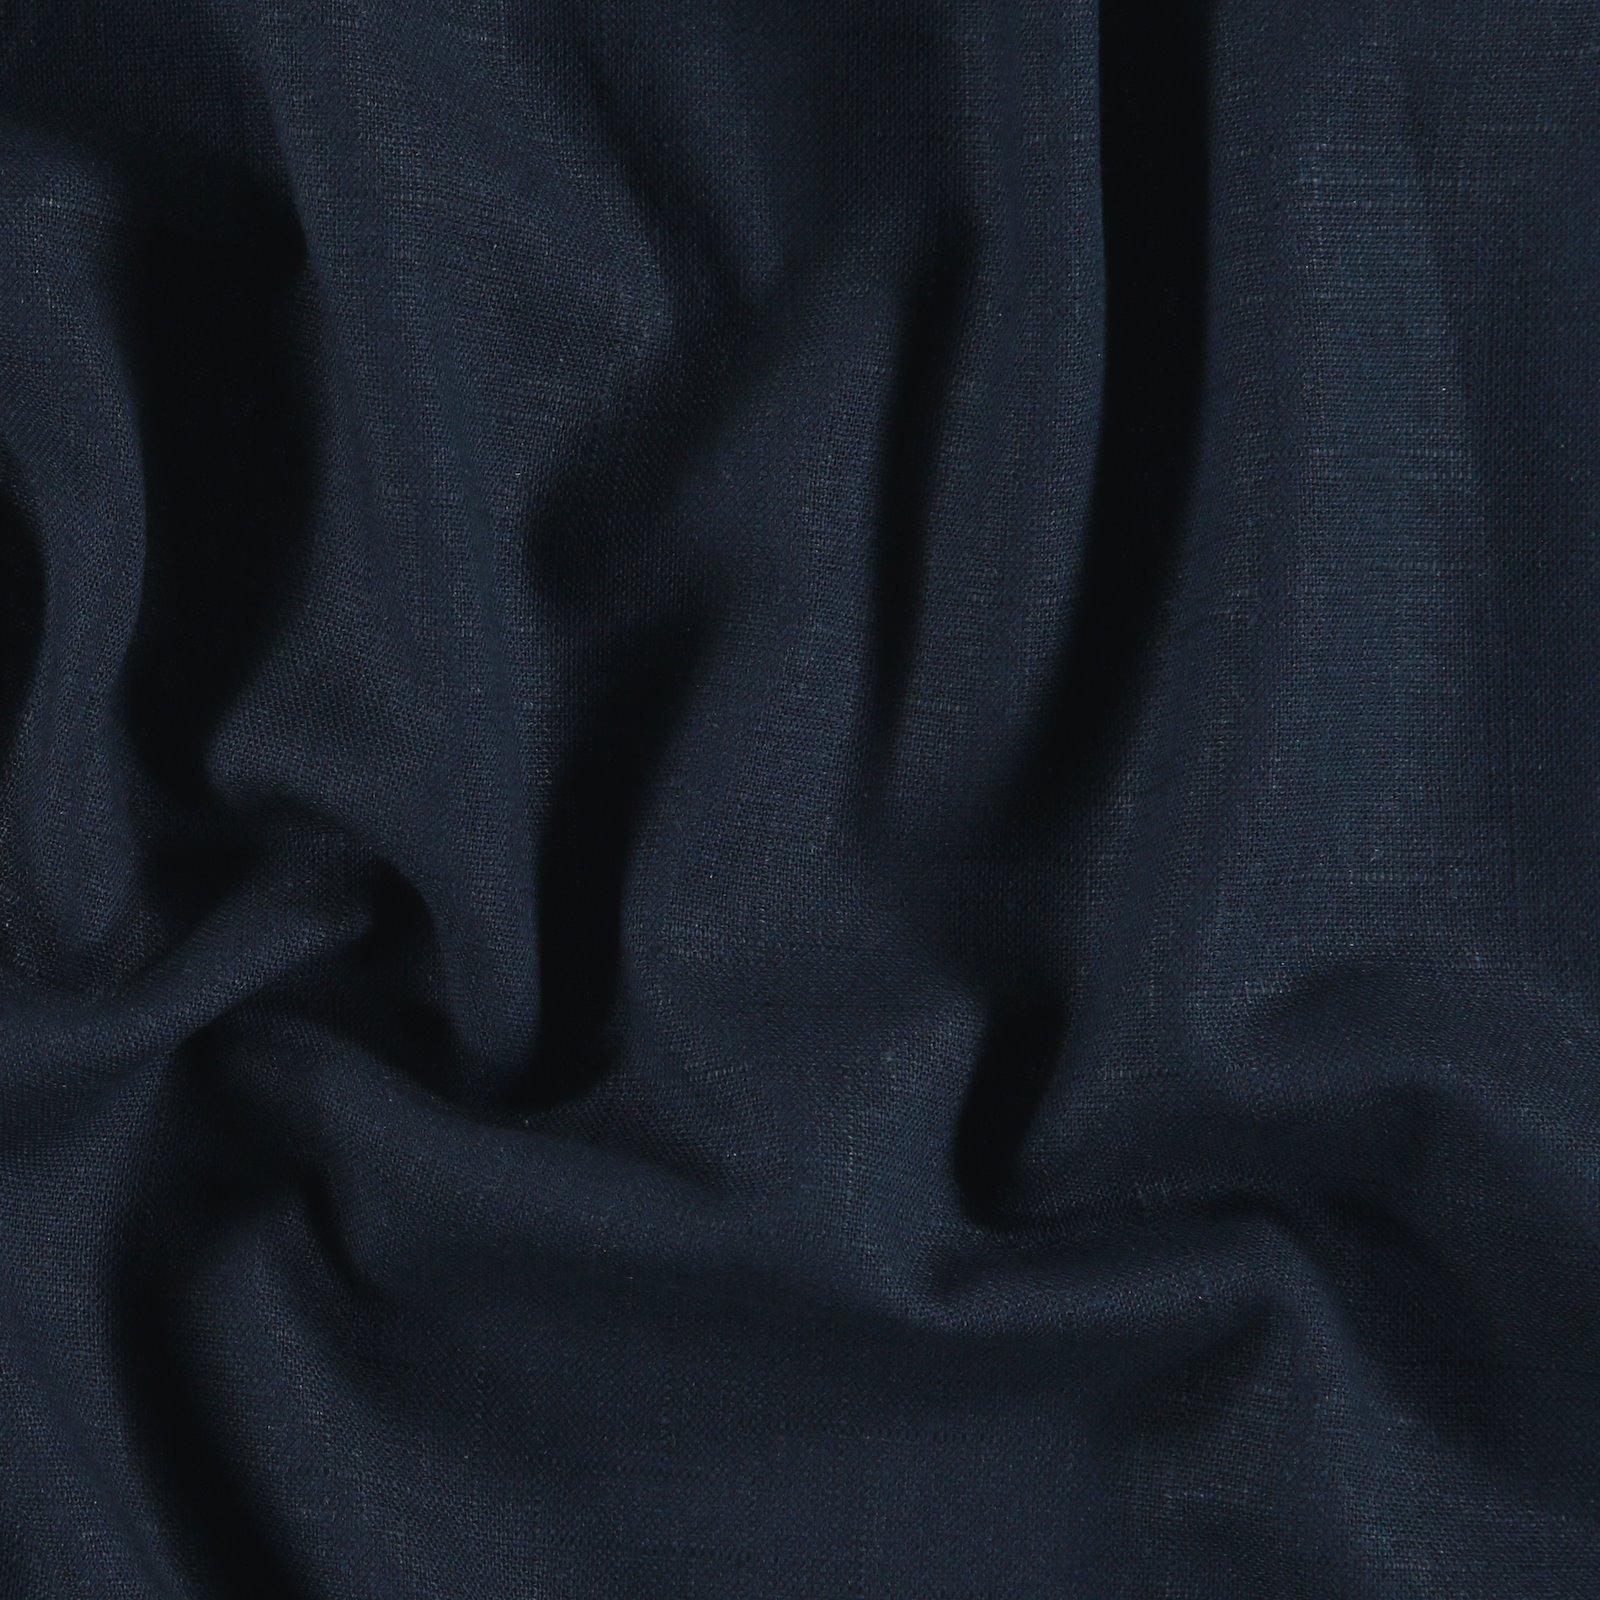 Coarse linen/viscose midnight blue 852417_pack